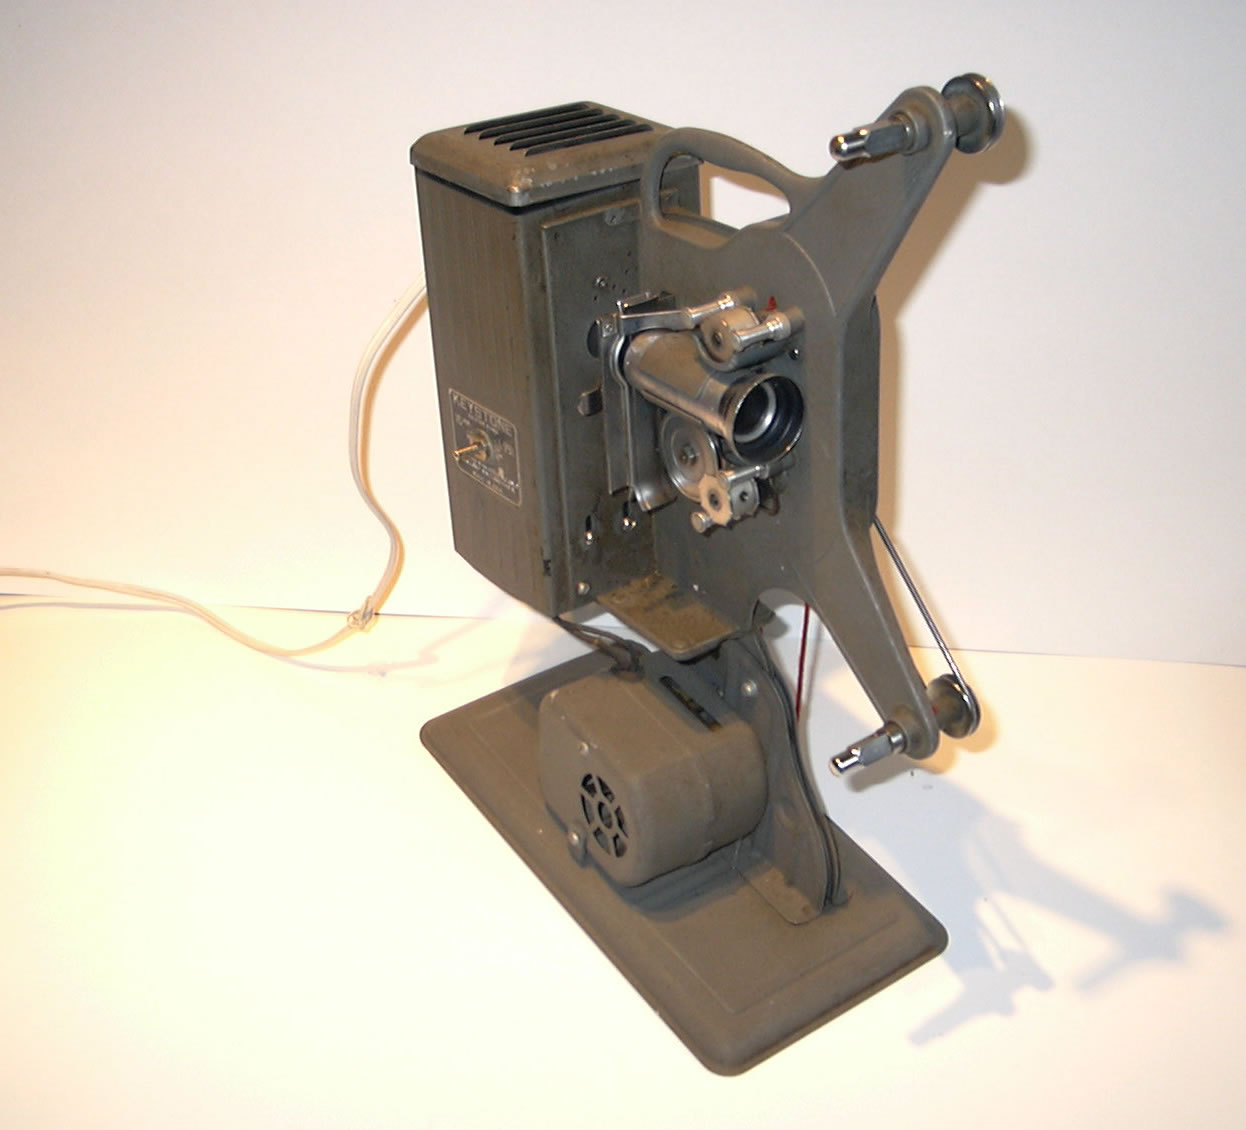 MicrophoneRentals com > Vintage Equipment > Home Movie